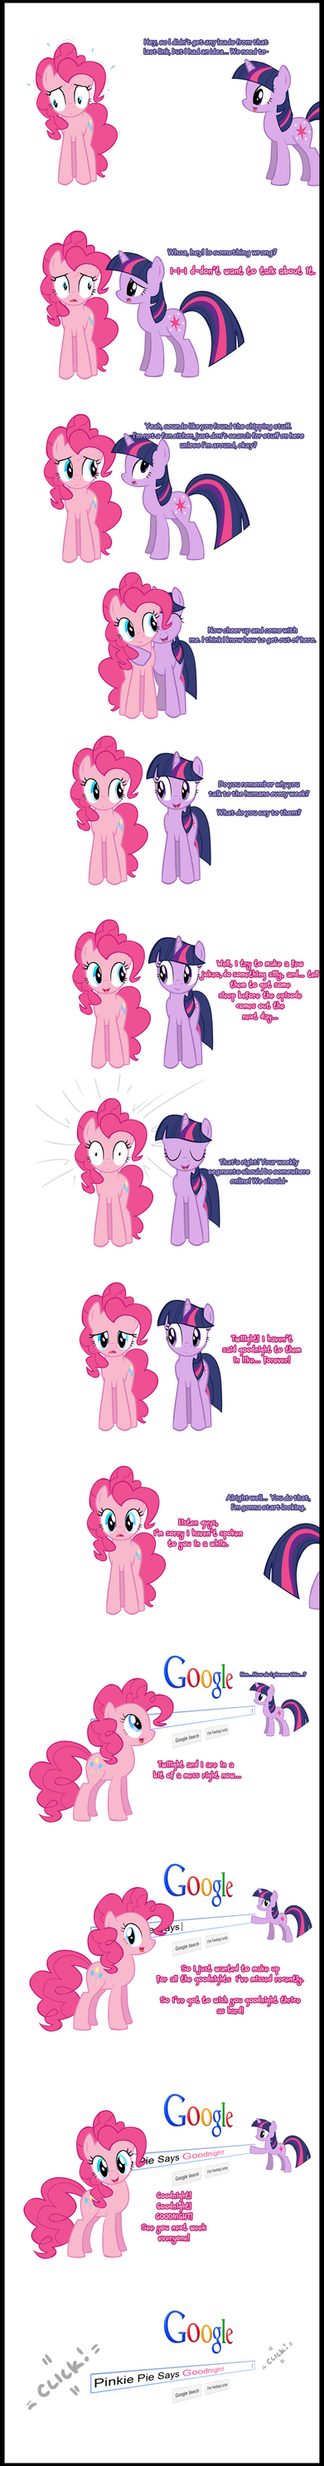 Pinkie Pie (finally) says Goodnight! by Undead-Niklos